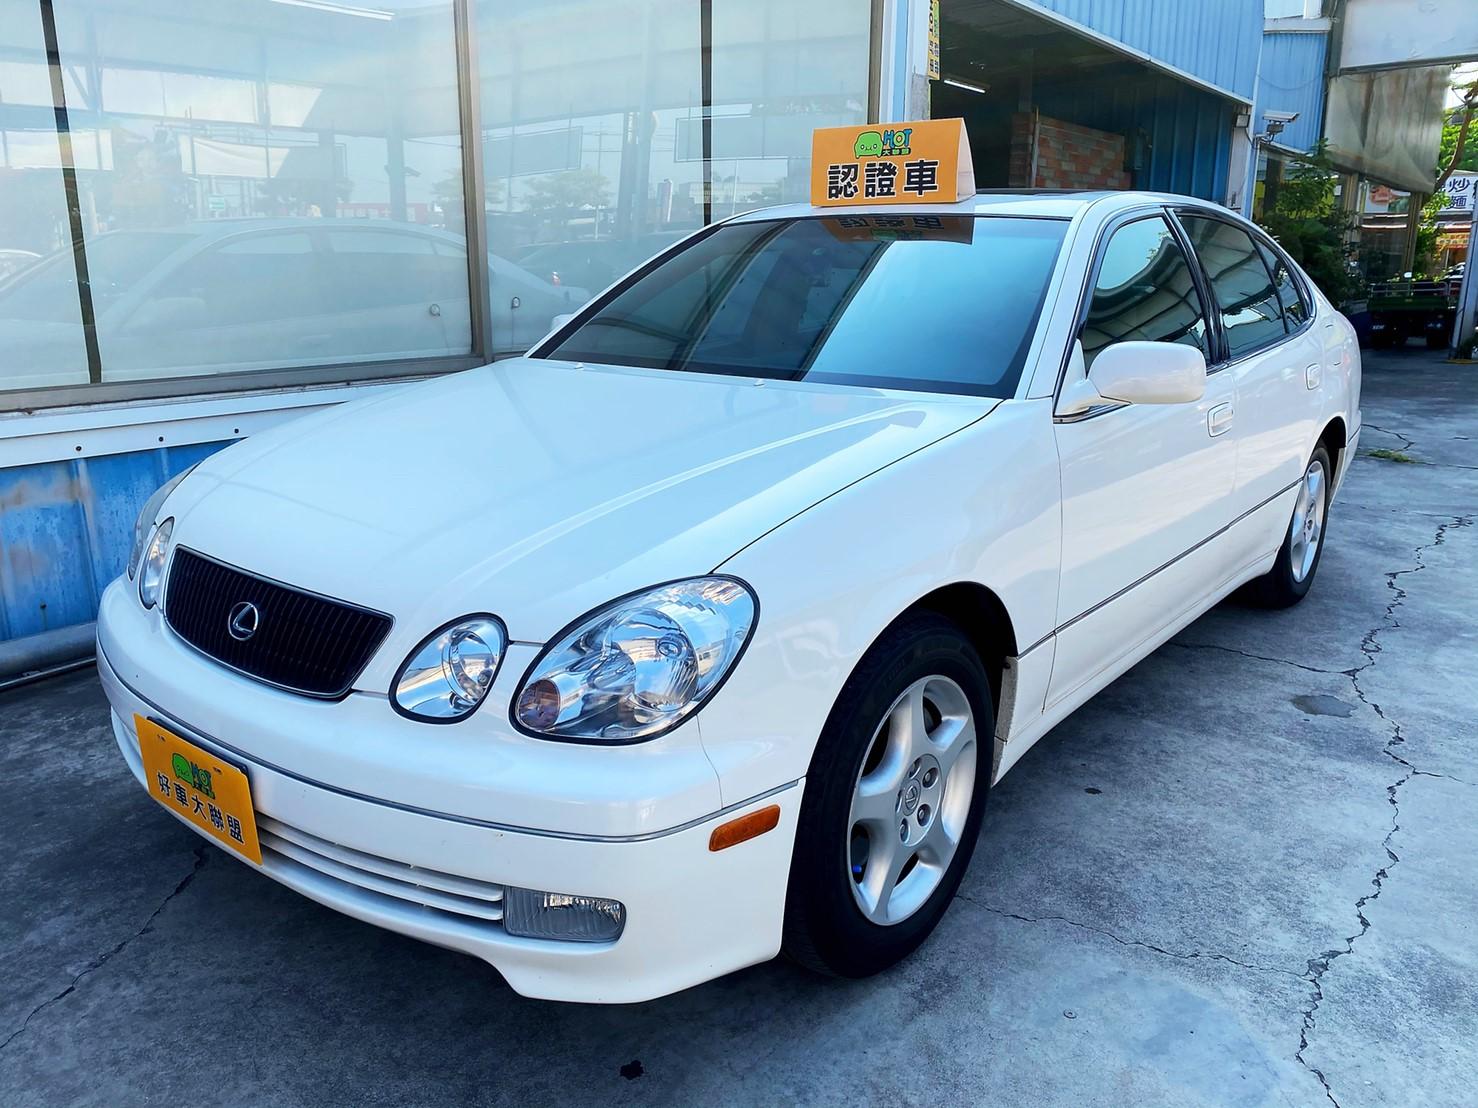 2000 Lexus 凌志 Gs